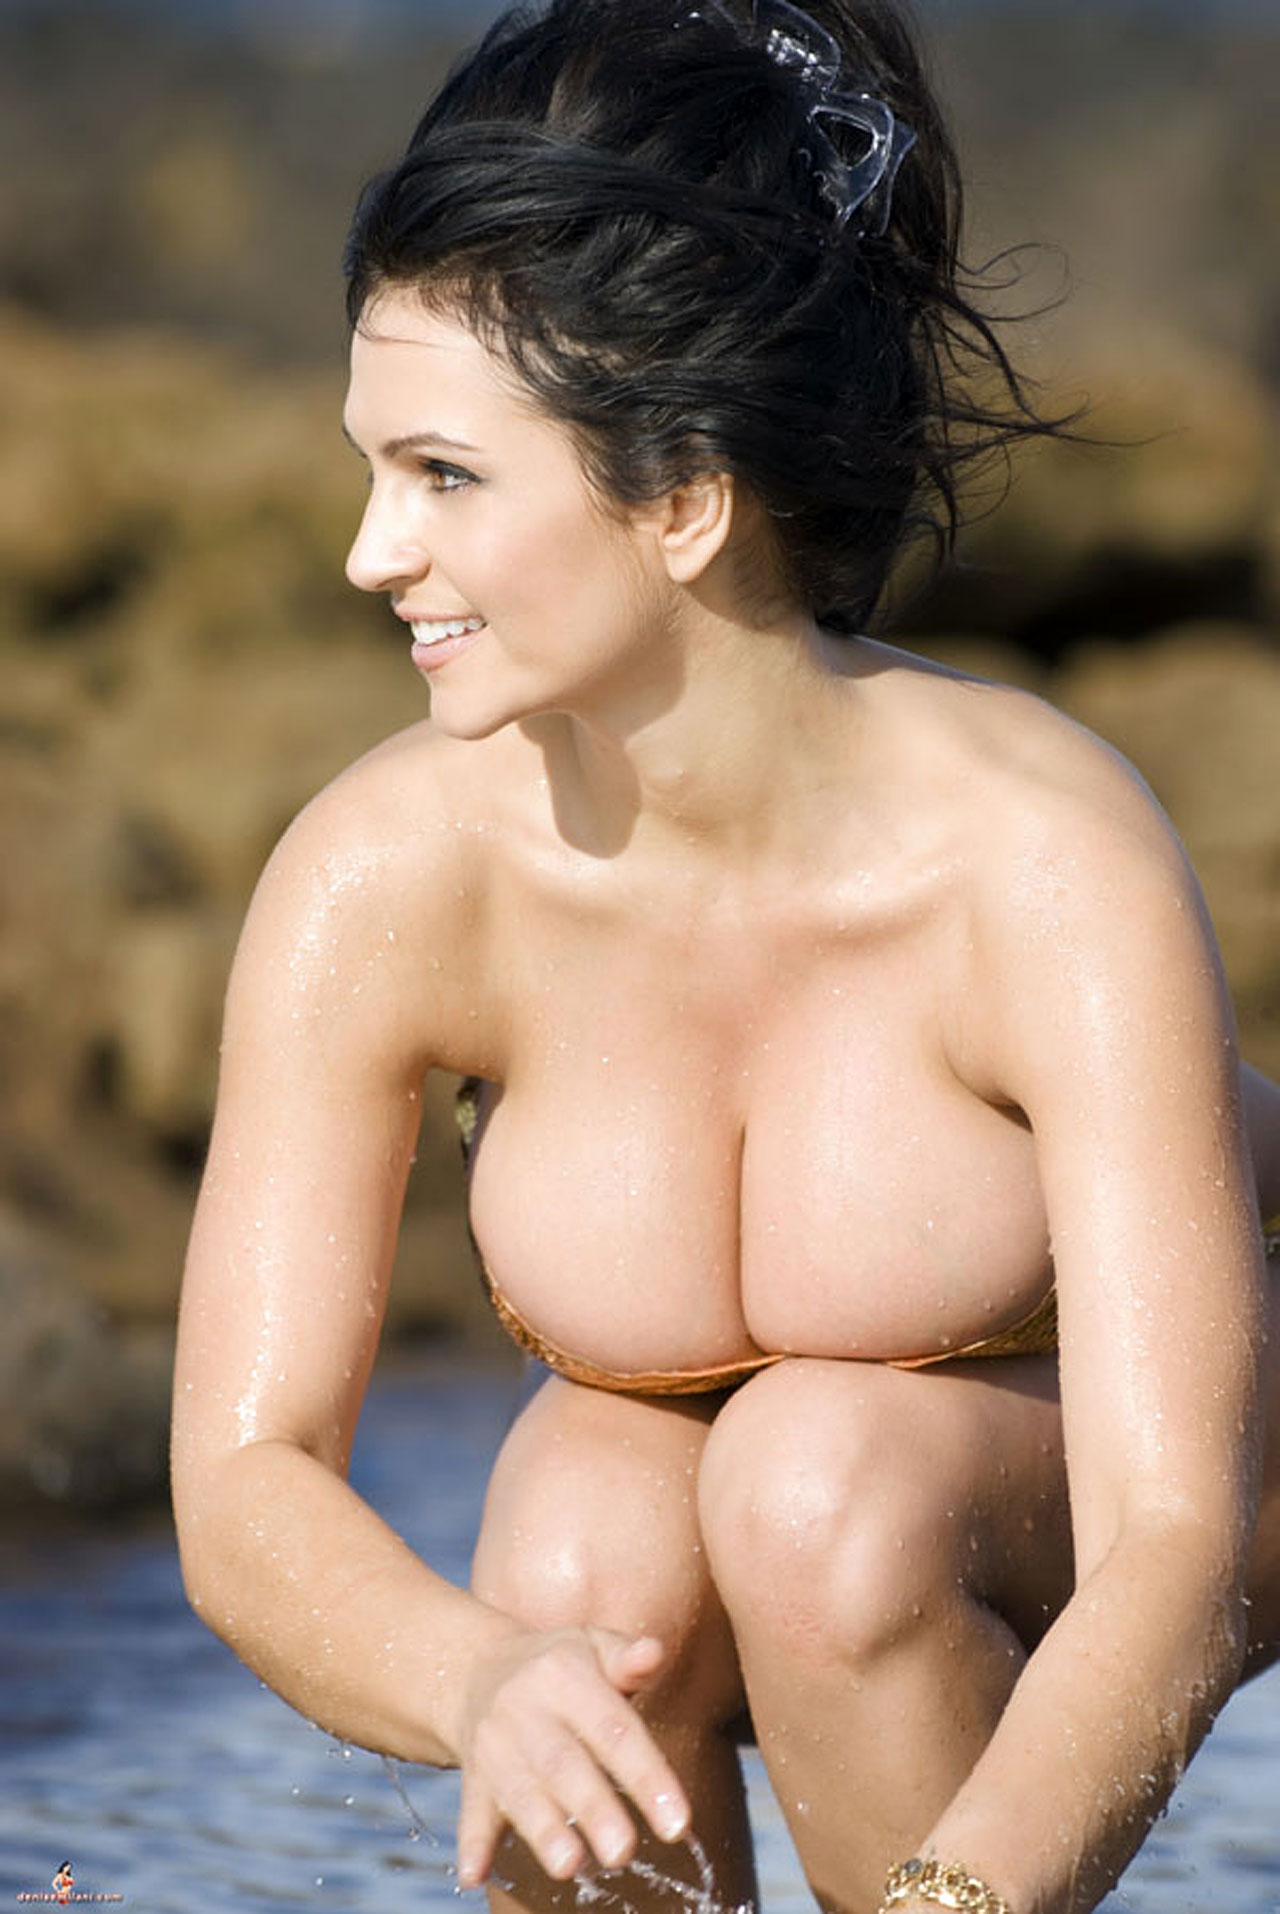 denise milani nude pics